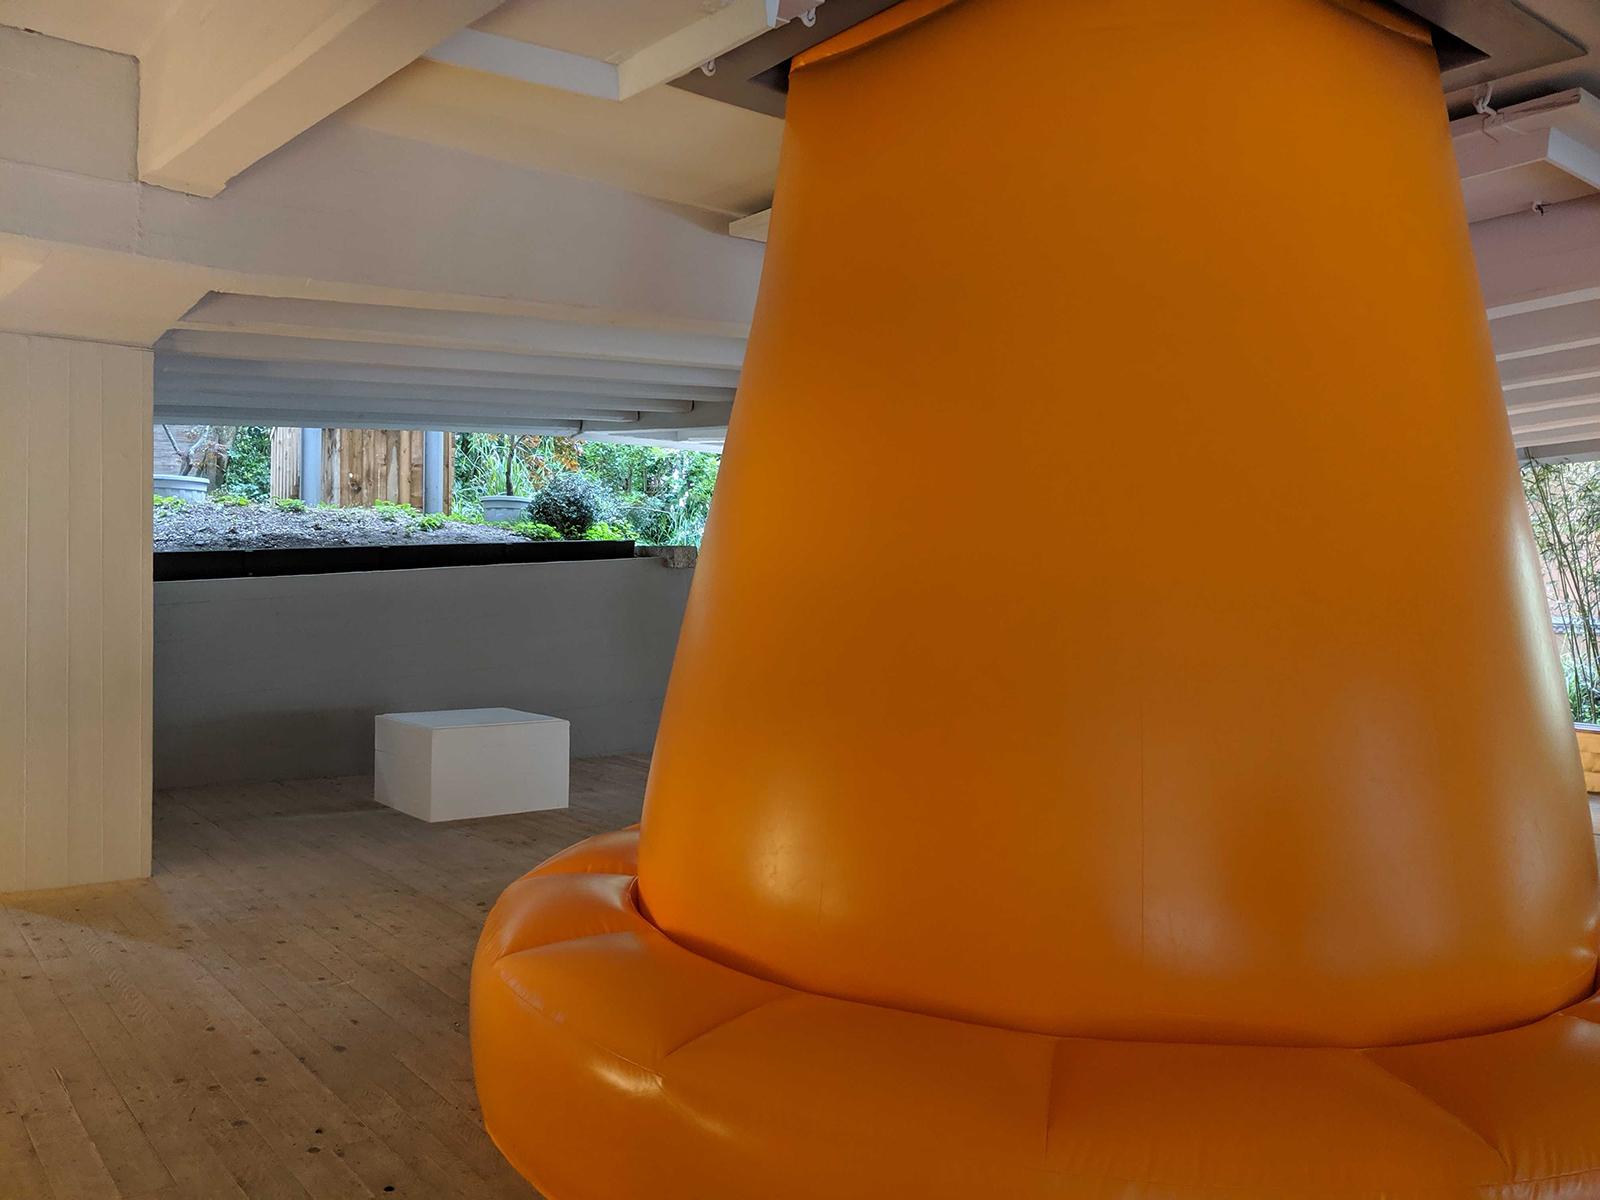 Japanese Pavilion at the Venice Biennale